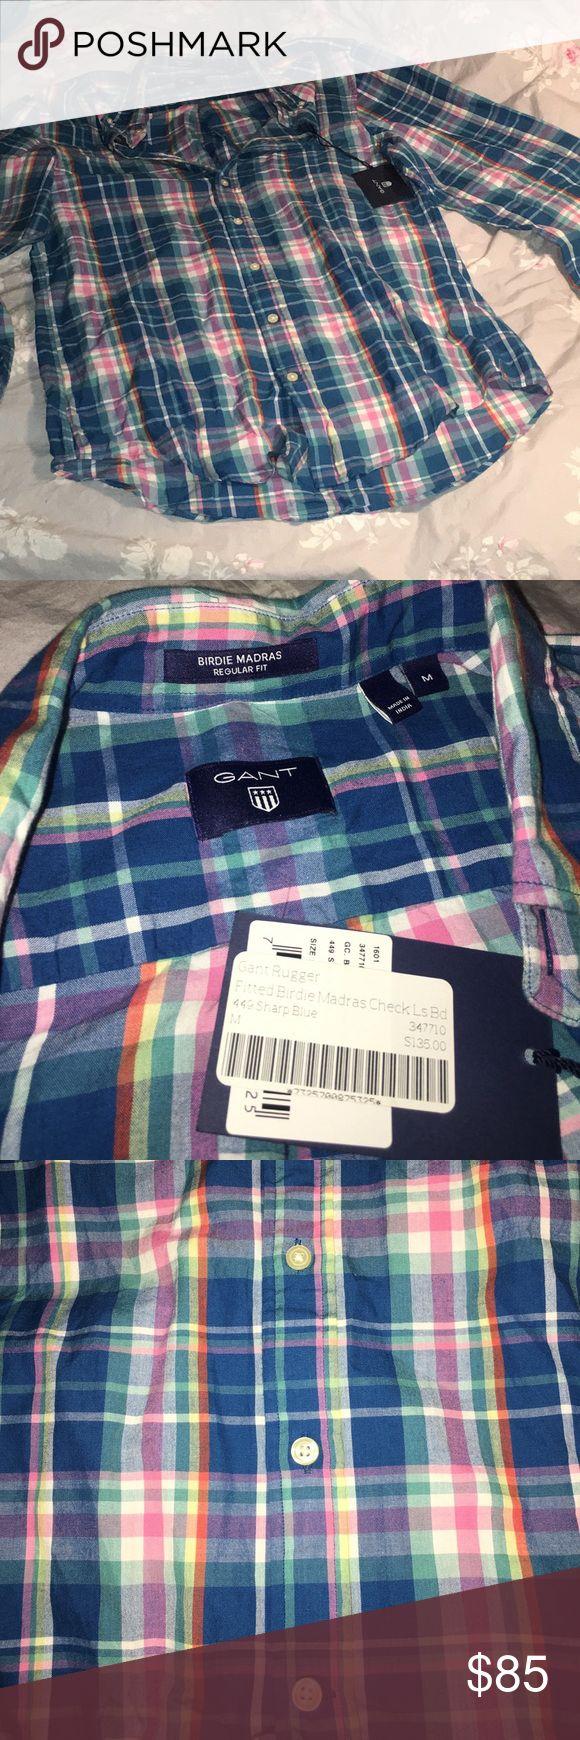 Men's plaid shirt Brand new plaid shirt, still has tags on. 100% cotton. Gant Shirts Casual Button Down Shirts